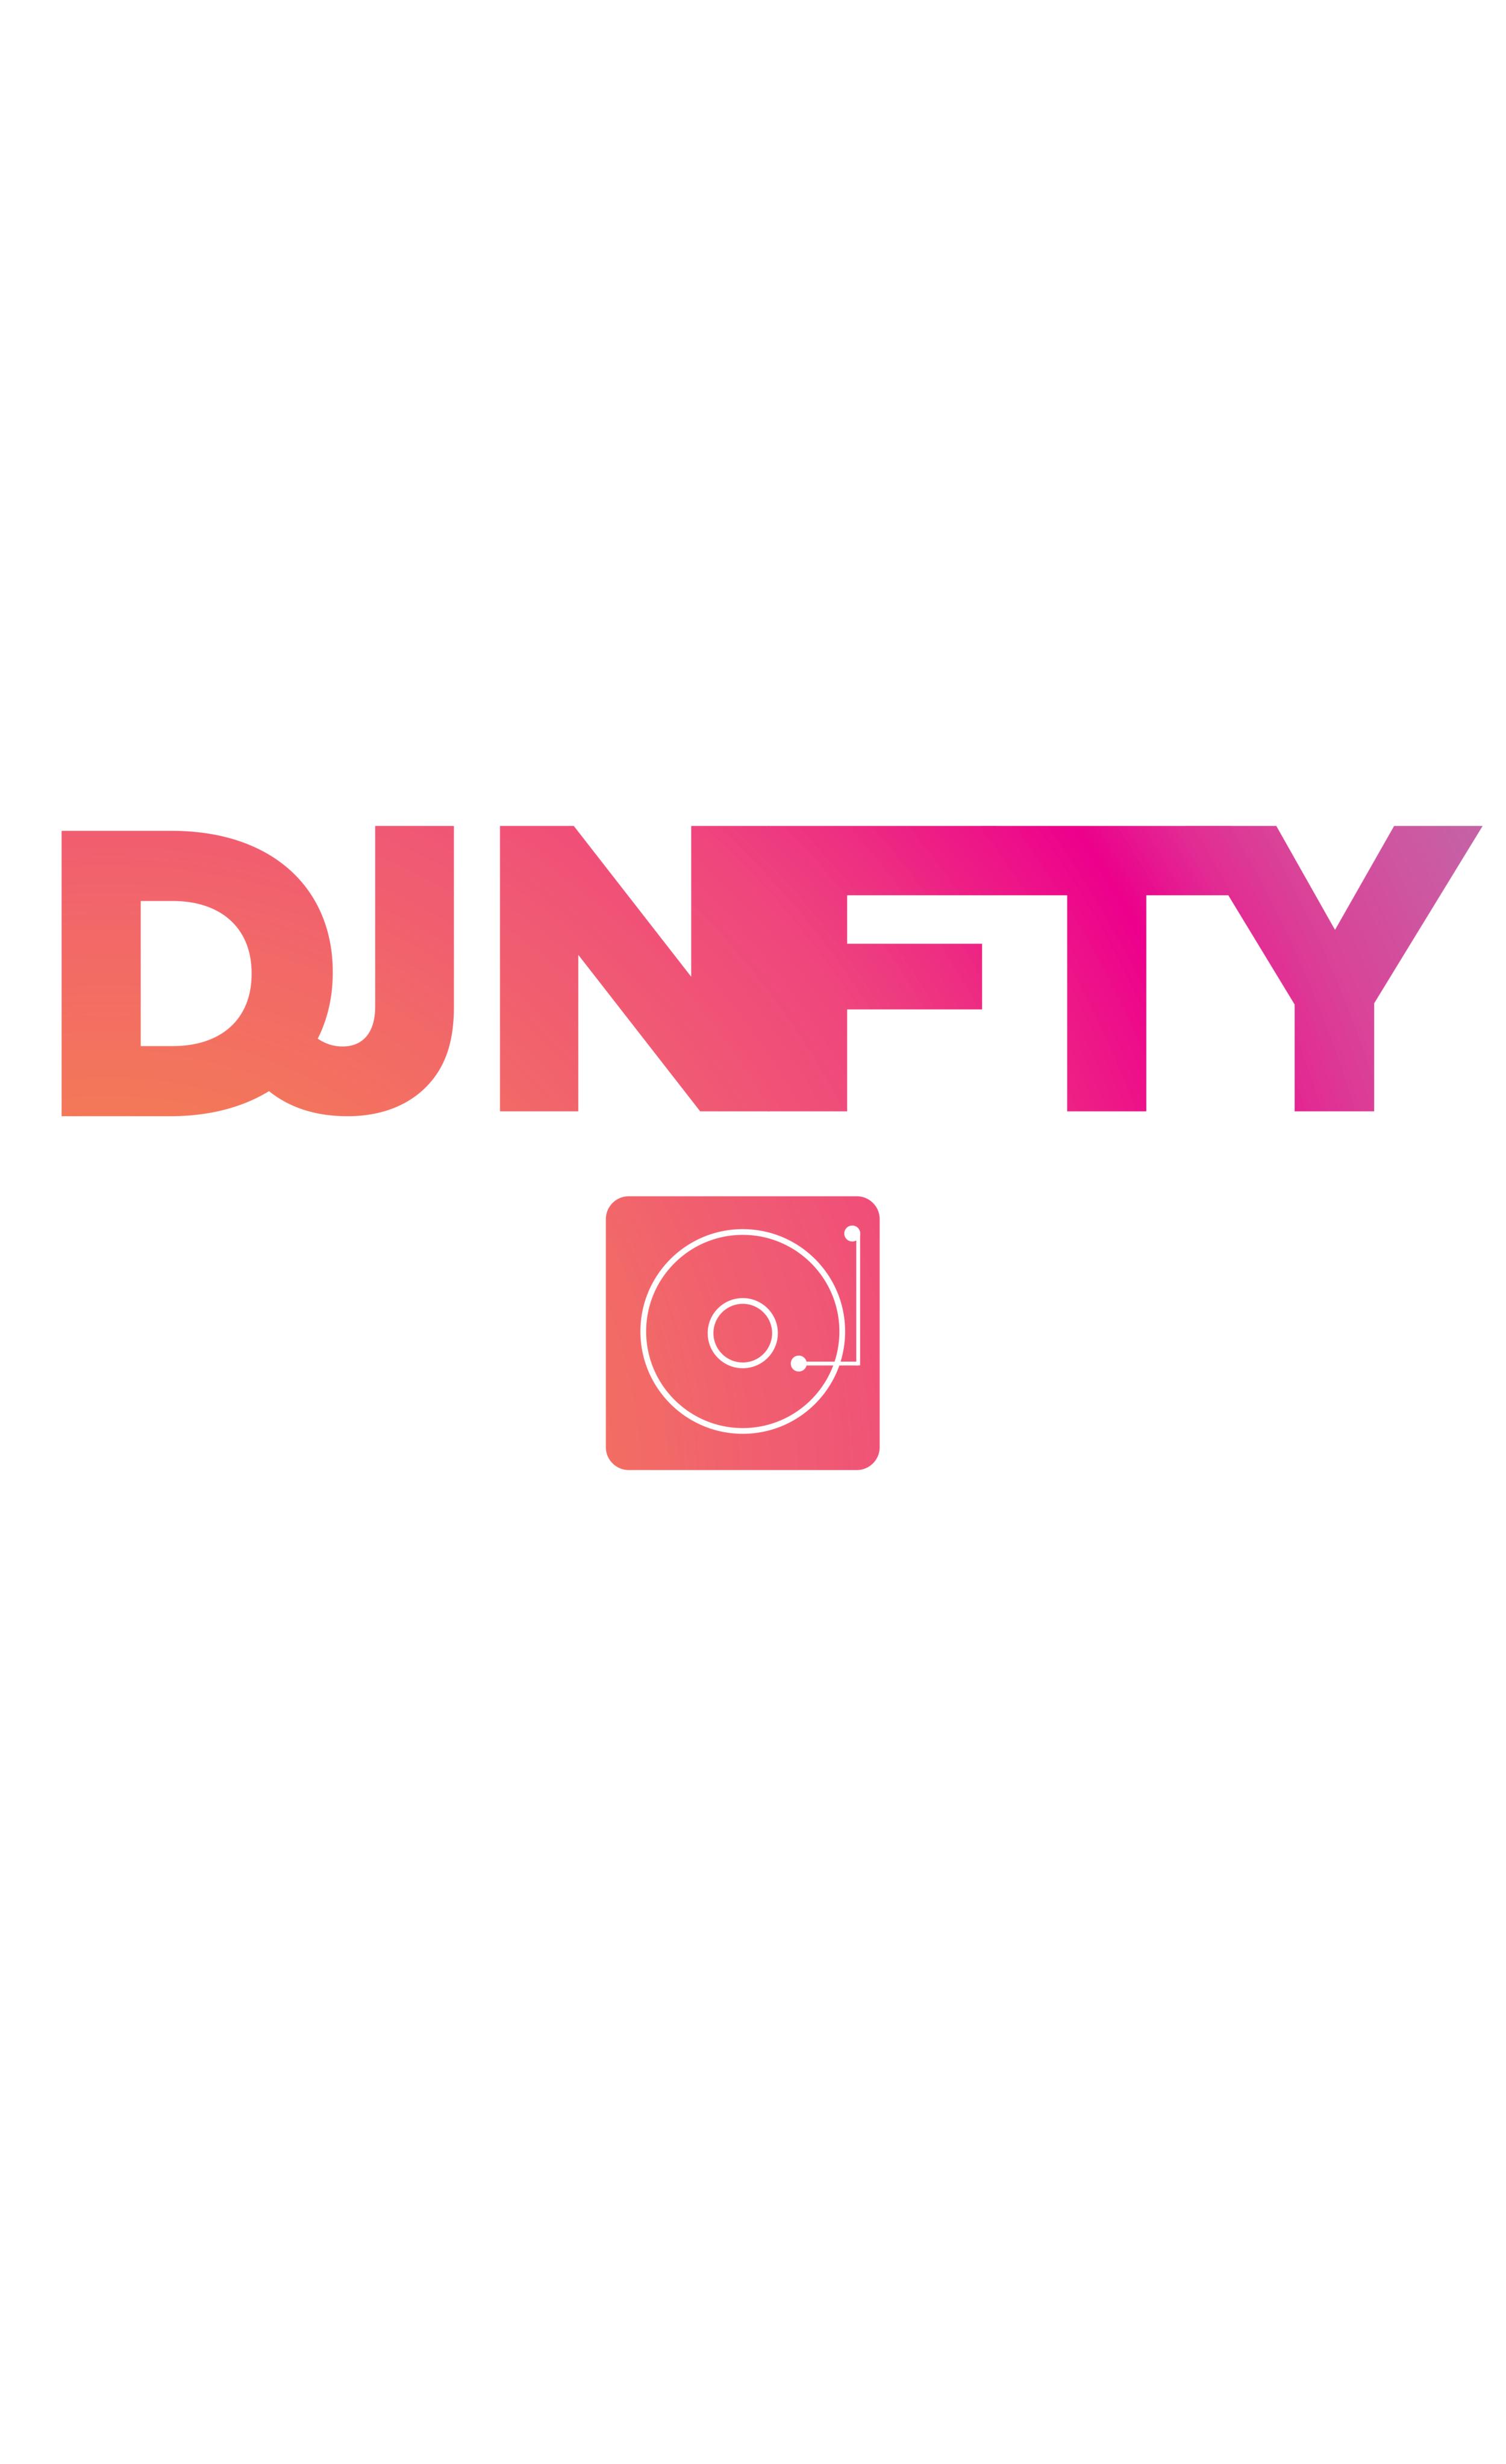 DJ NFTY-3.png